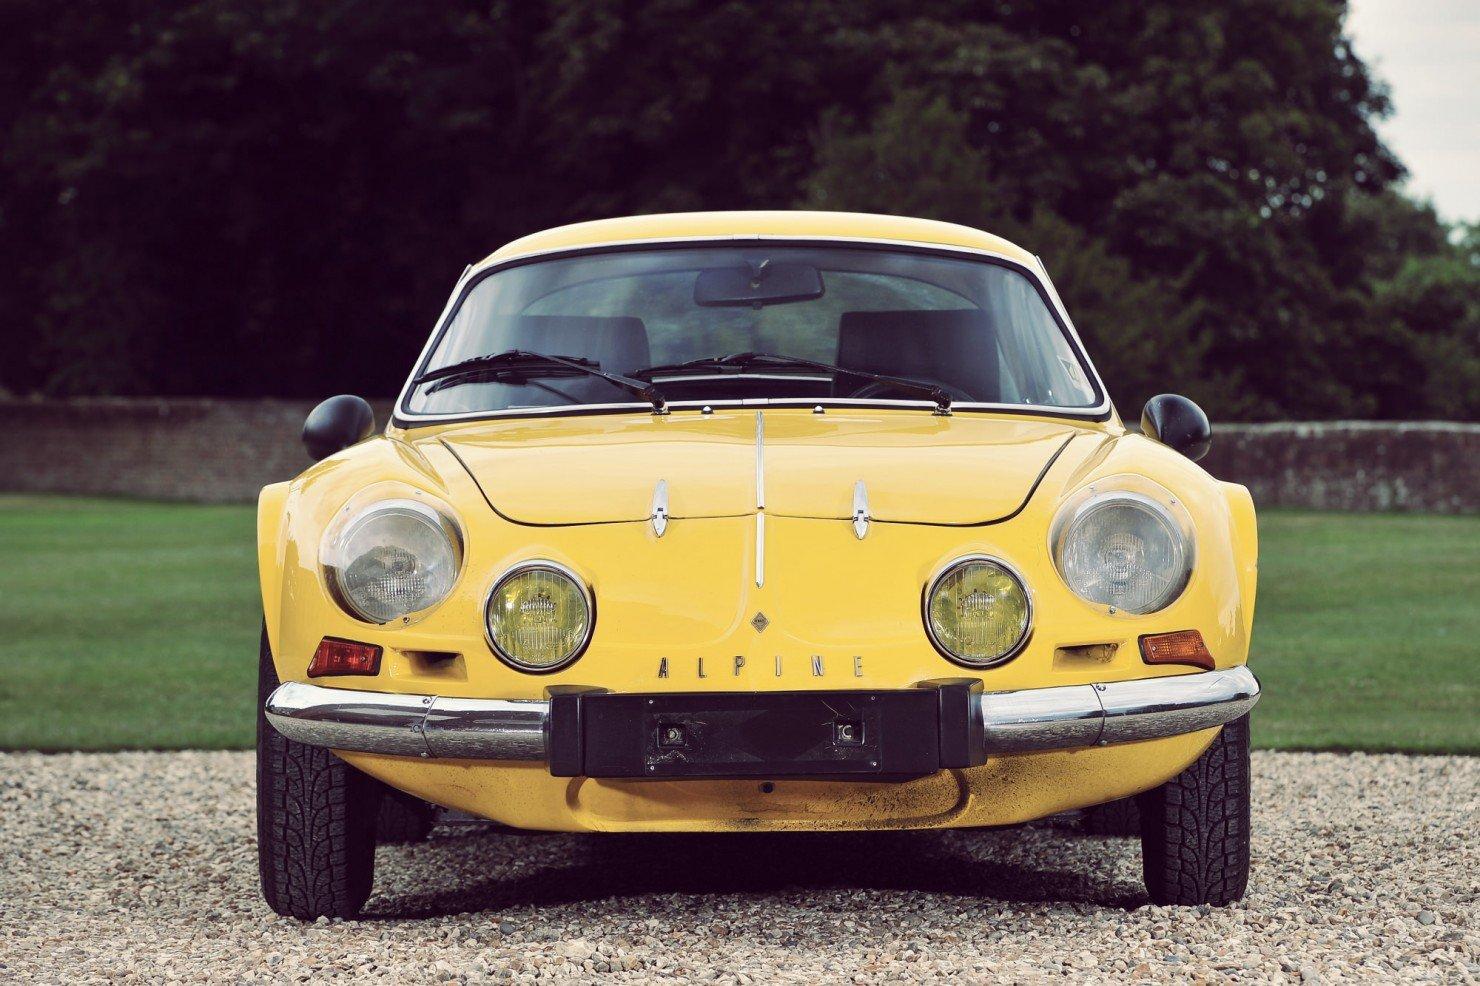 Alpine A110 Car 10 1480x986 Alpine Renault A110